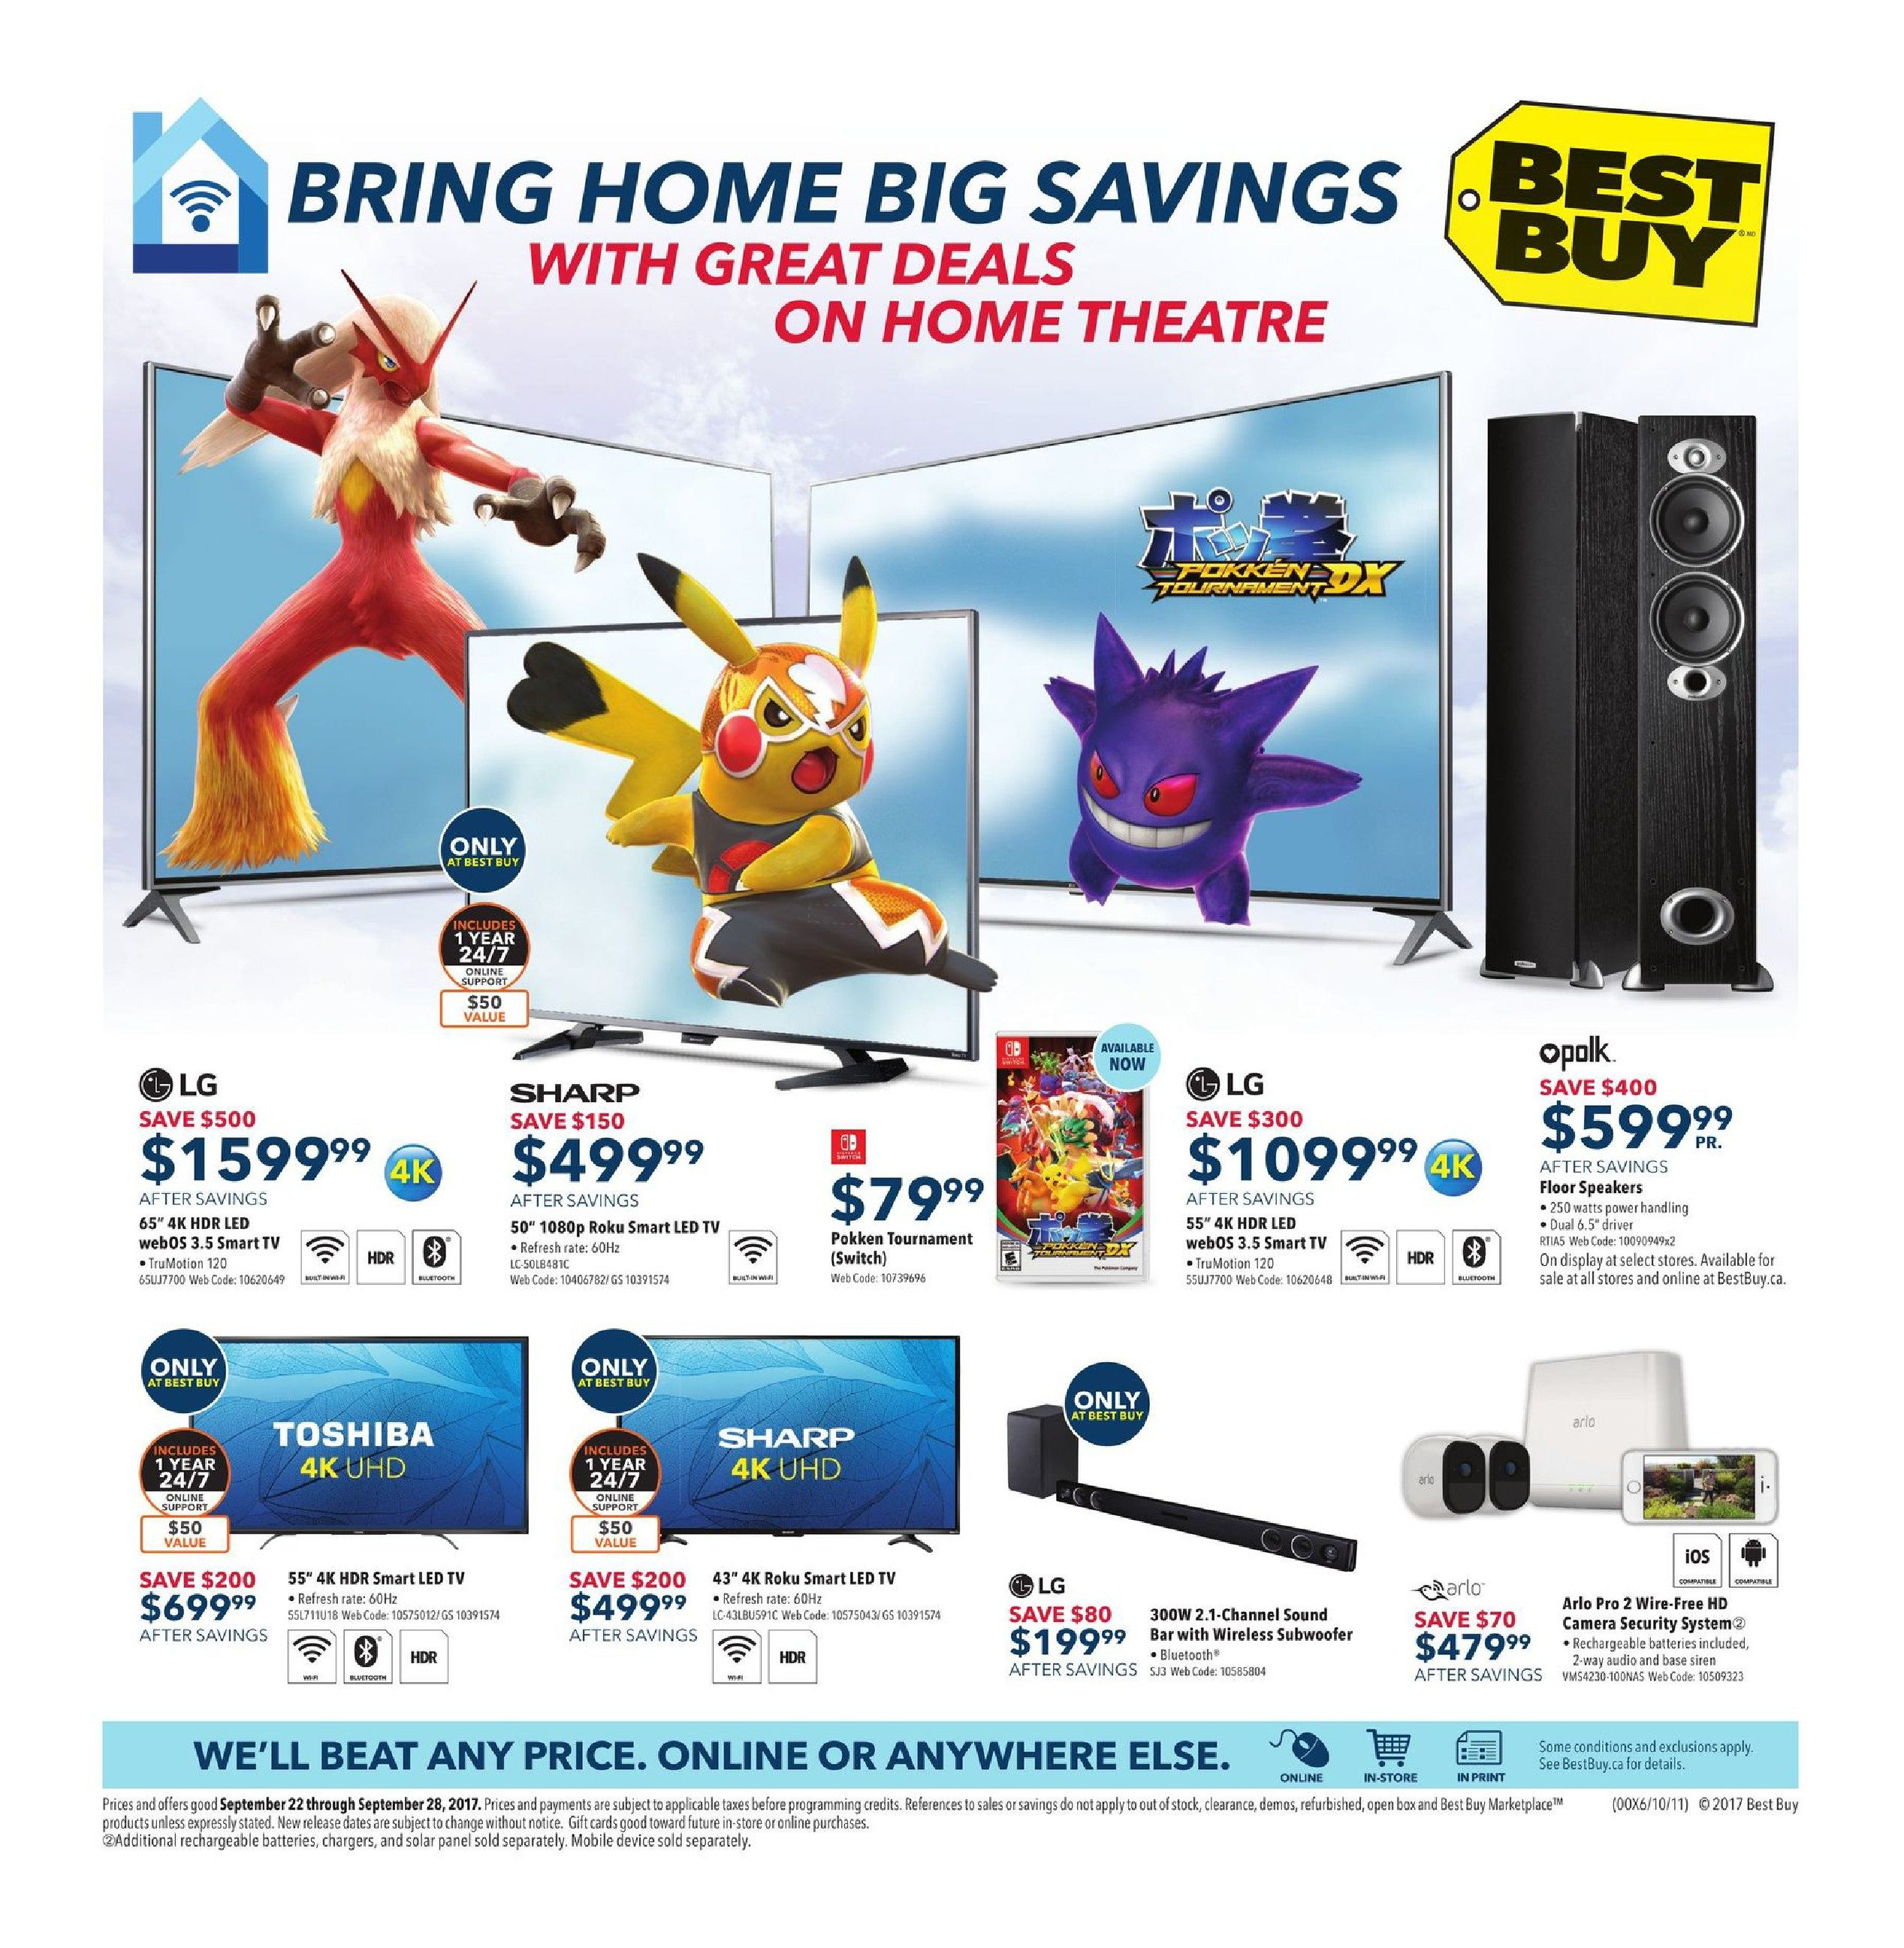 Best buy weekly flyer weekly bring home big savings sep 22 best buy weekly flyer weekly bring home big savings sep 22 28 redflagdeals fandeluxe Image collections